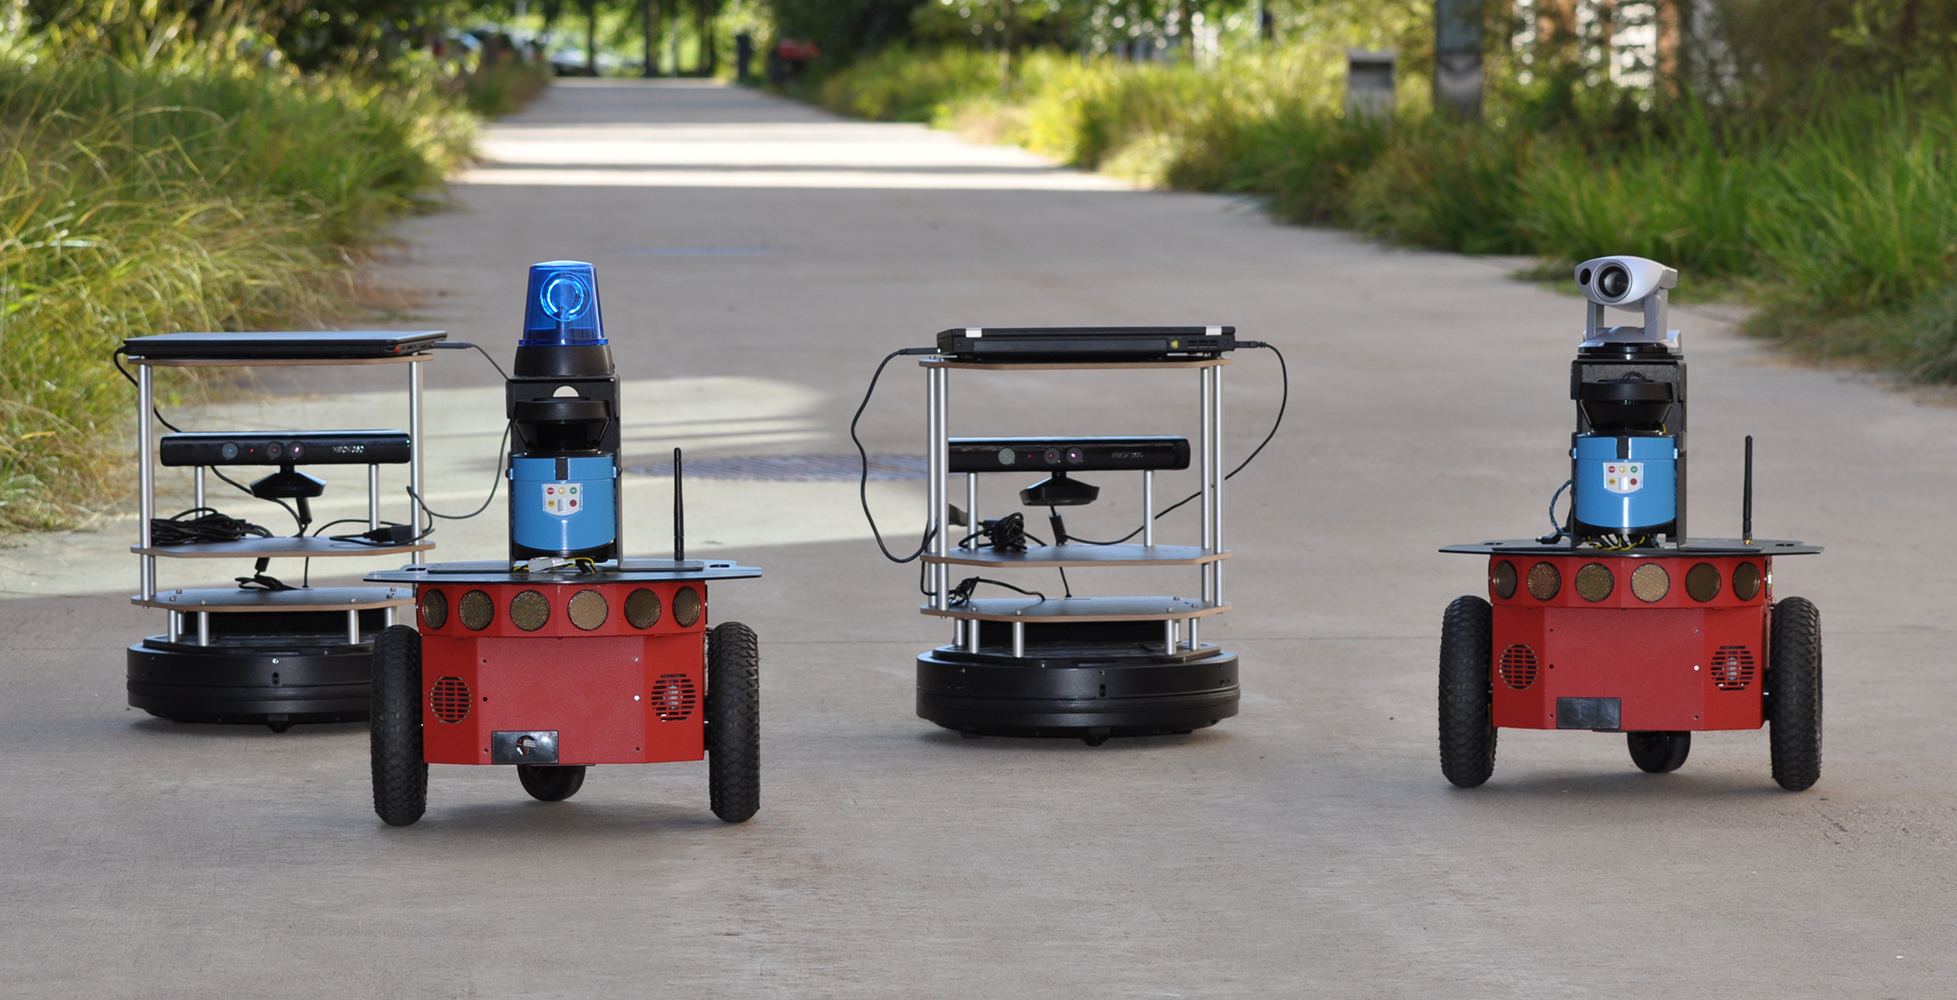 mobile robots R&d prototype platform for a surveillance robot mr3 is using 4 high torque stepper motors with 72 kg m of torque.